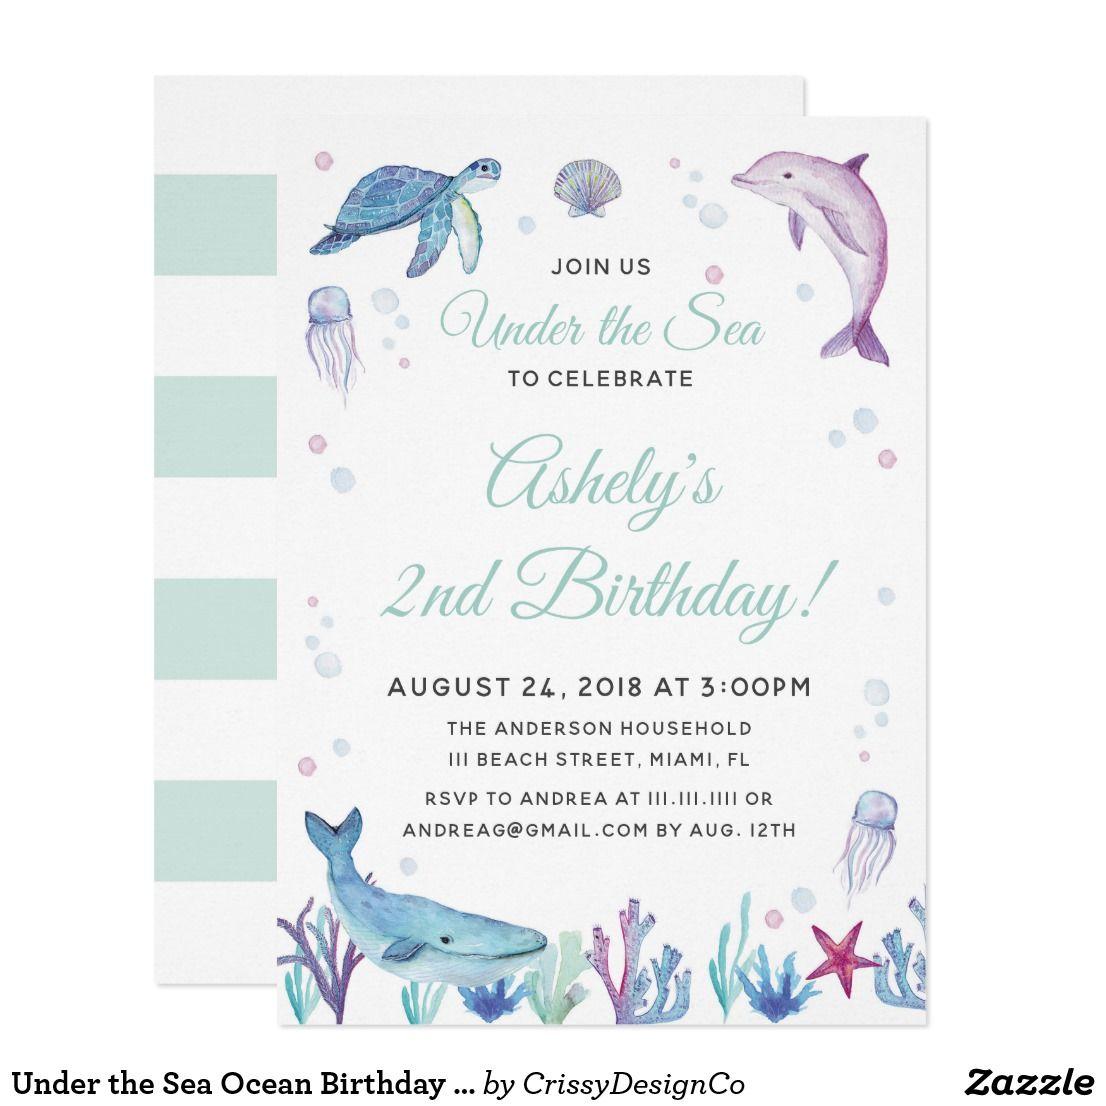 Under the Sea Ocean Birthday Party Invitation | CrissyDesignCo ...